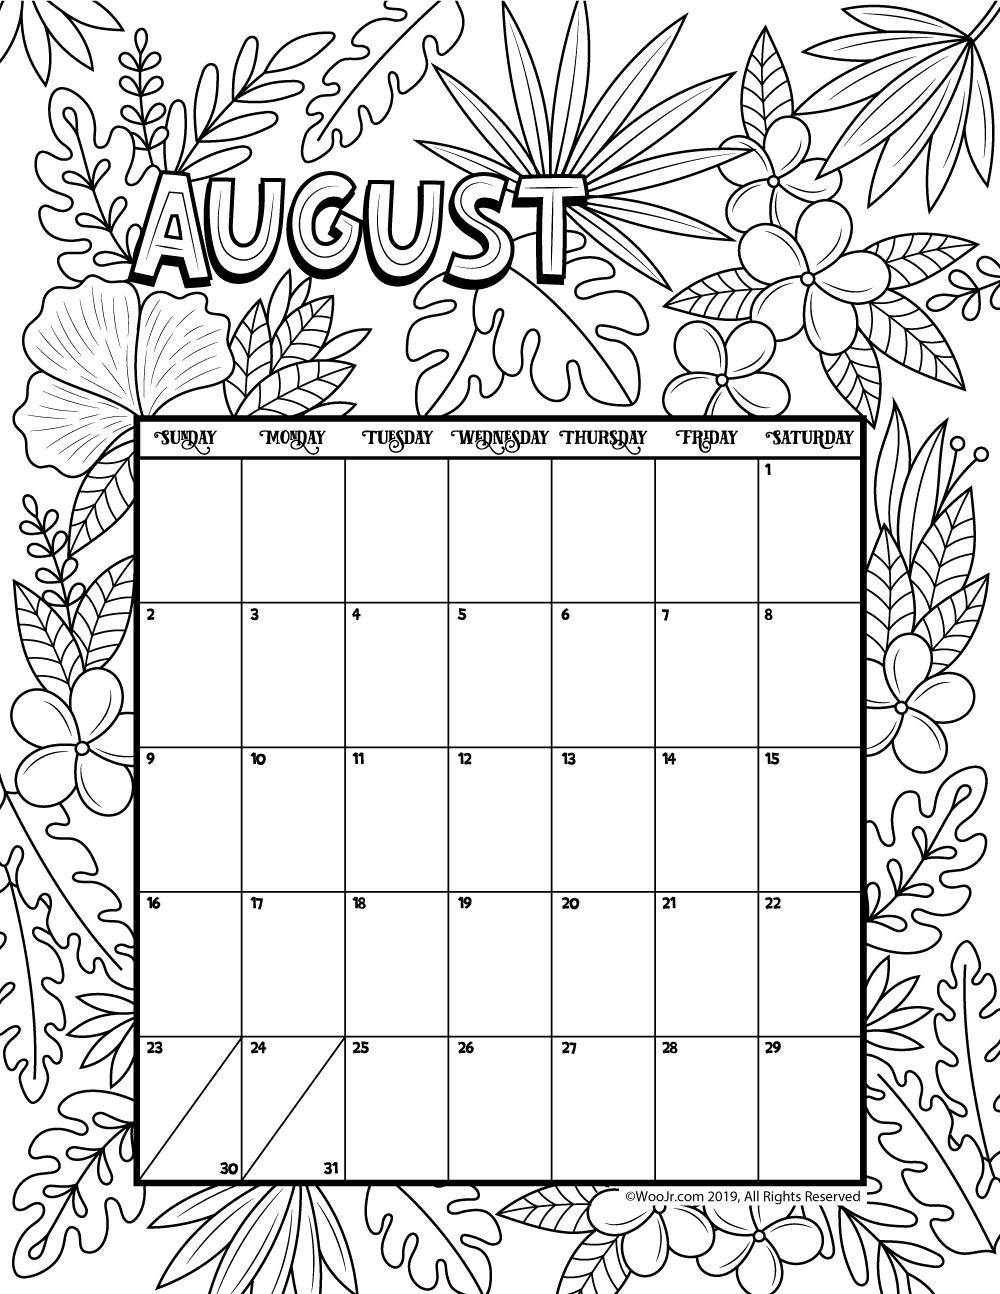 August 2020 Coloring Calendar | Woo! Jr. Kids Activities